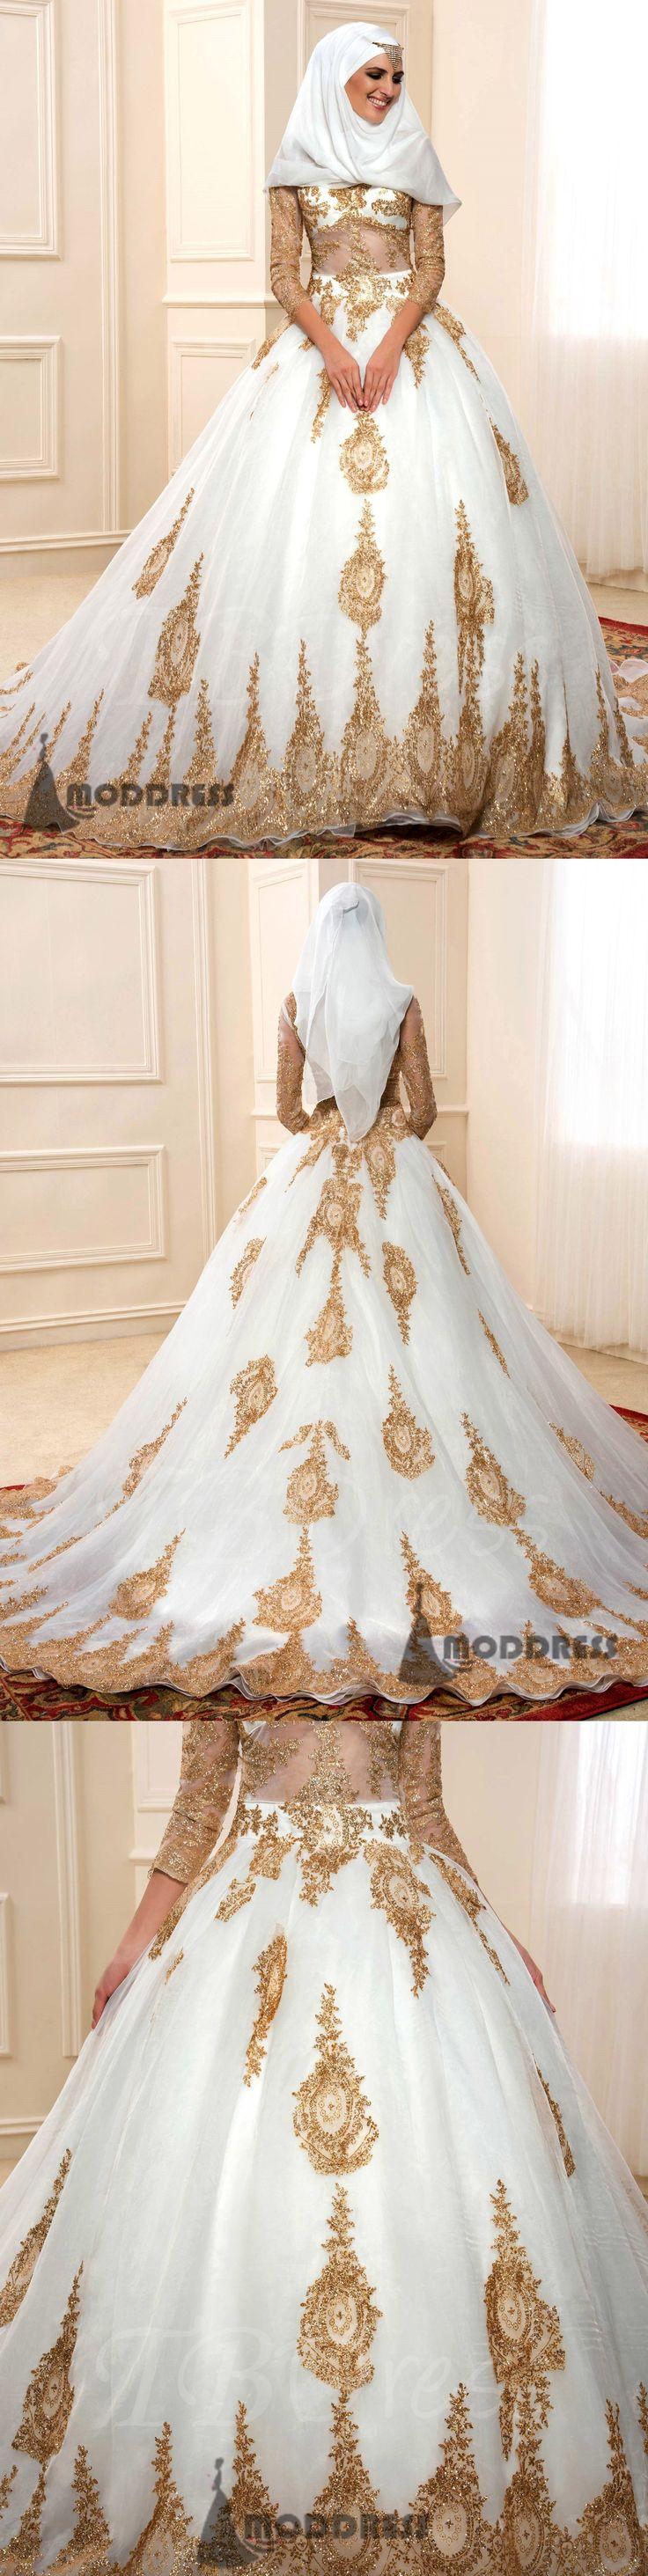 Muslim Wedding Dresses Long Sleeve Applique Ball Bridal Dresses,HS683  #fashion#promdress#eveningdress#promgowns#cocktaildress